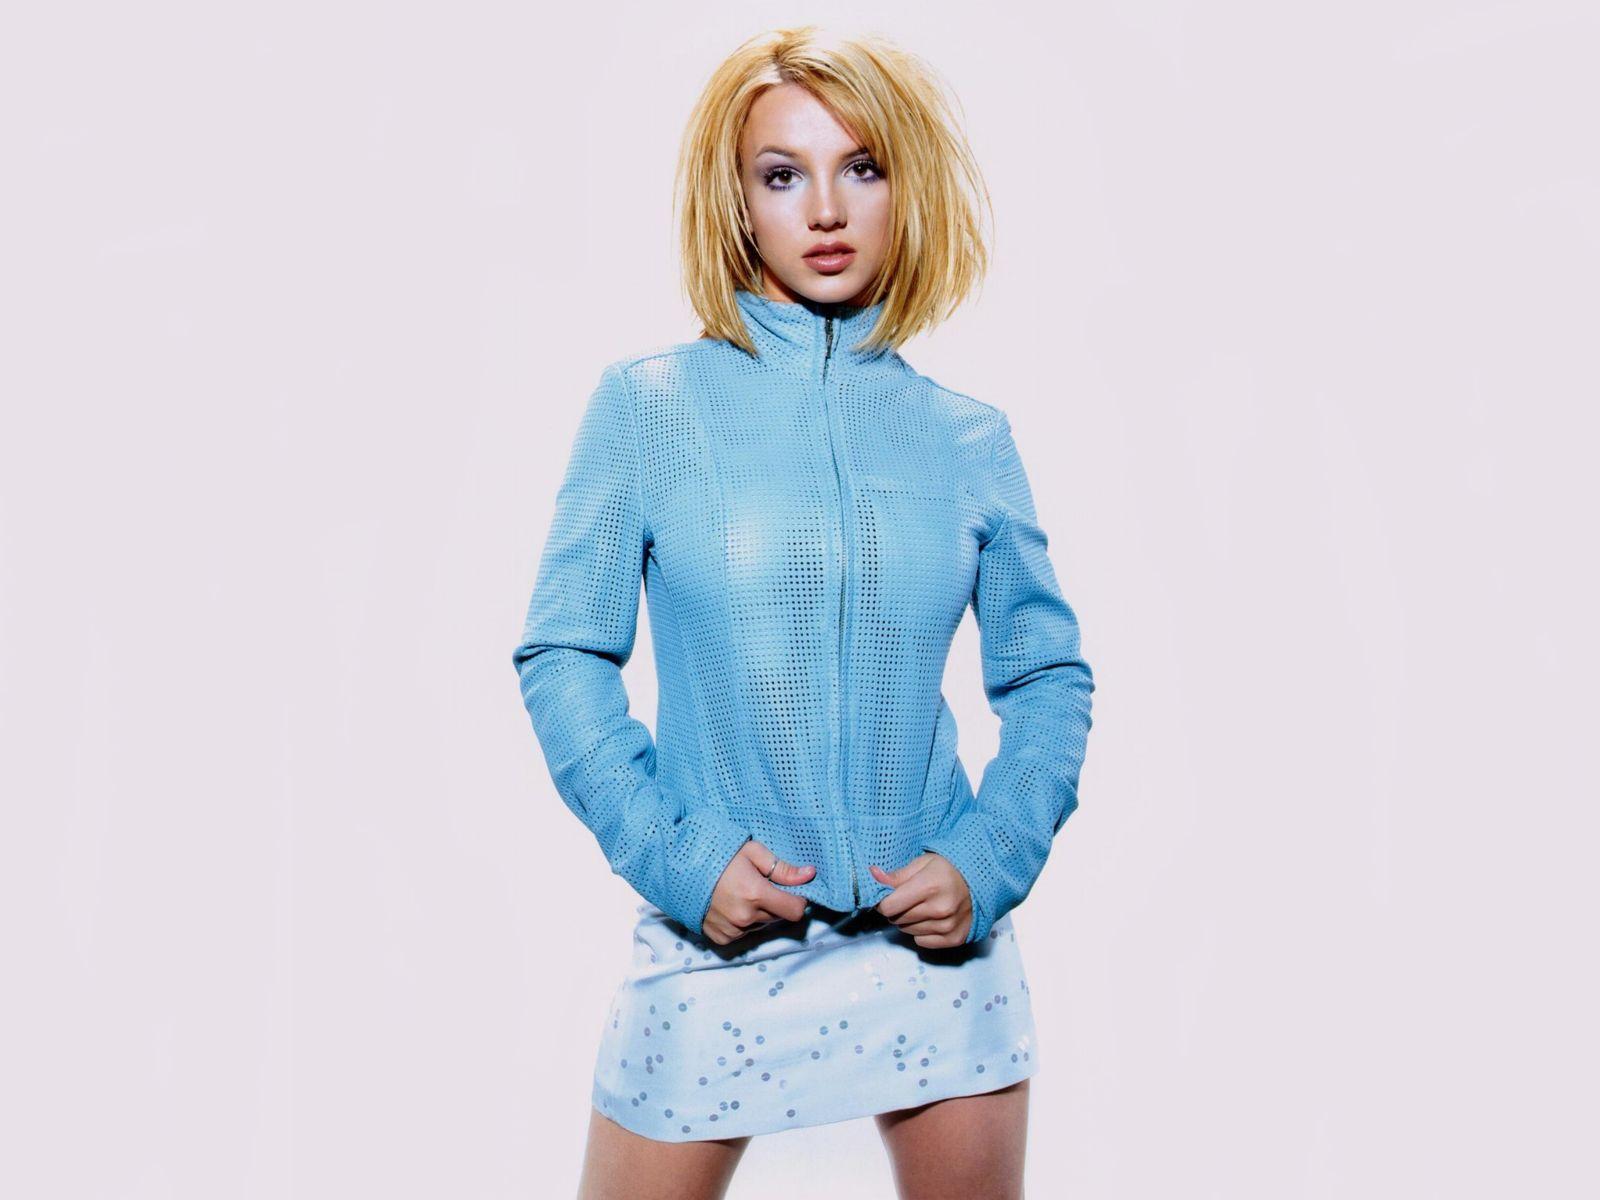 http://3.bp.blogspot.com/-YZcAssE9-z8/To1ZfqwyWoI/AAAAAAAADAs/kvx2be09Nus/s1600/Britney++spears+01+%2528201%2529.jpg